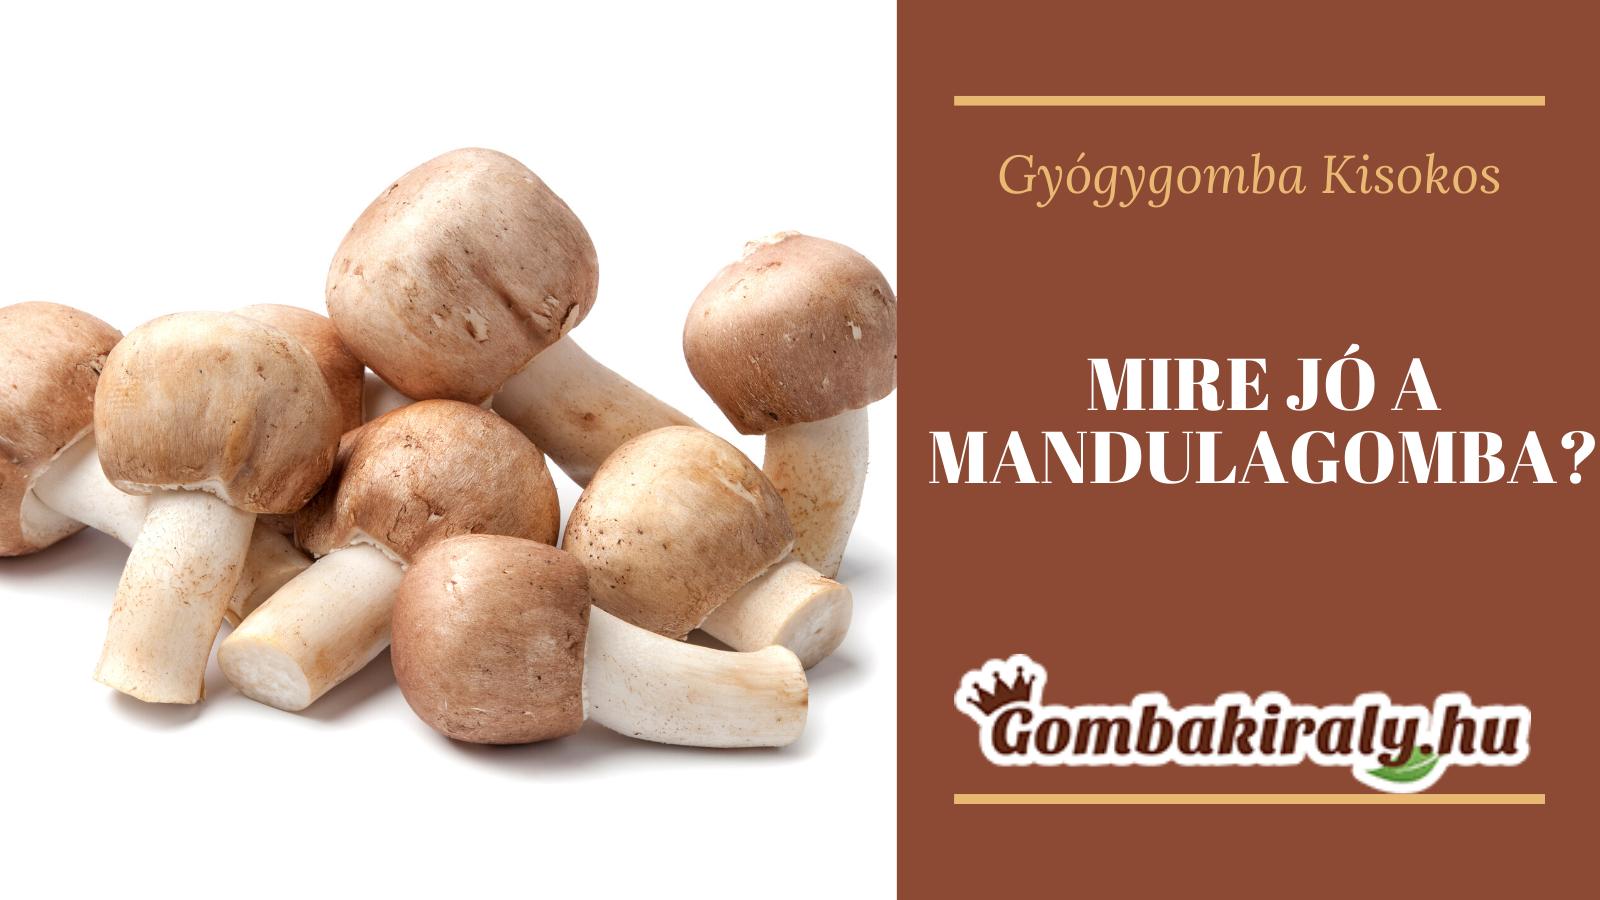 Mire jó a Mandulagomba?